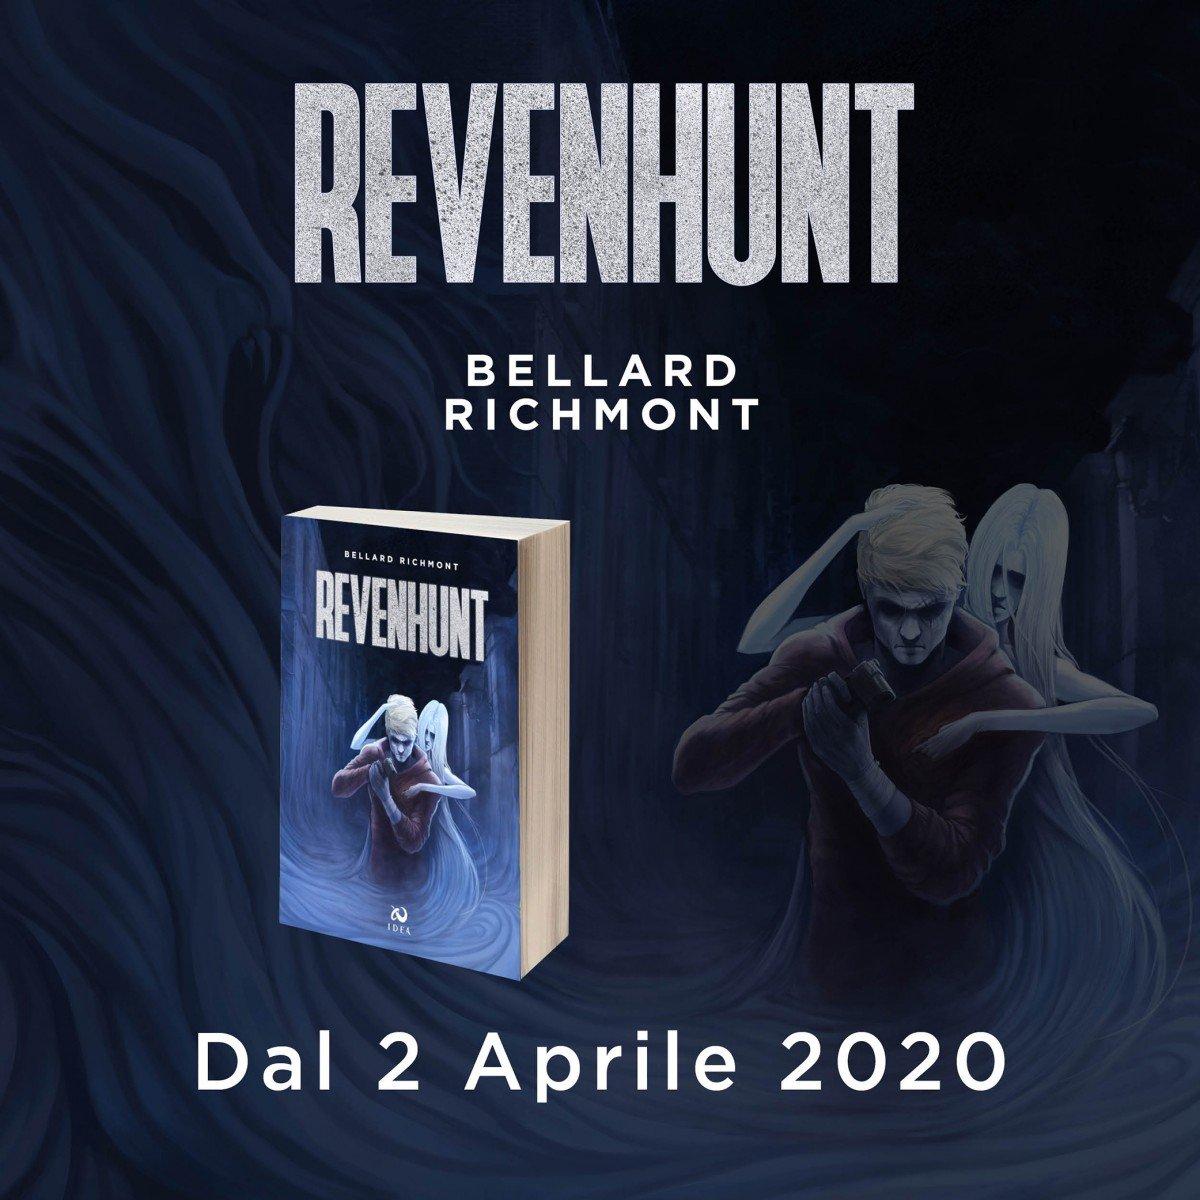 RevenHunt di Bellard Richmont revenhunt RevenHunt di Bellard Richmont card Rev Sara